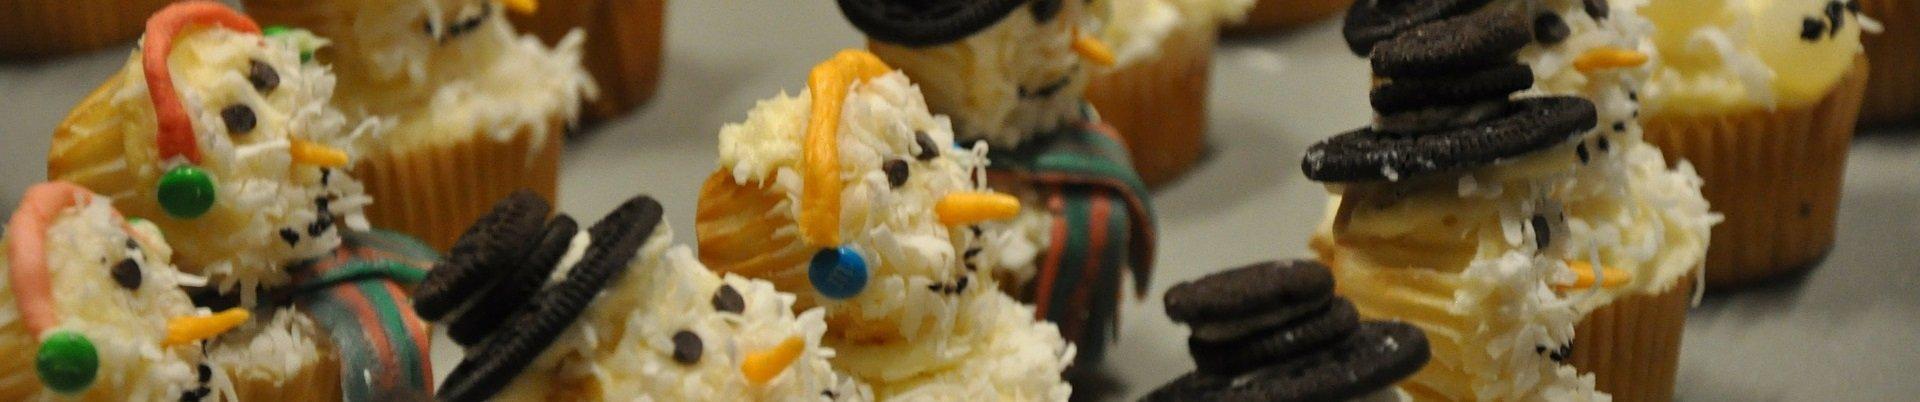 cupcake natalizi pupazzi di neve